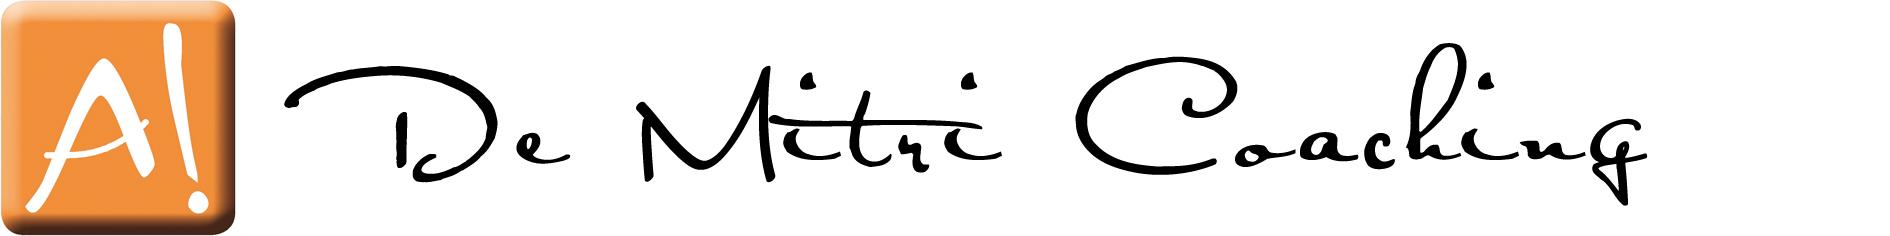 A! De Mitri Coaching | Finde Deinen Weg! Logo